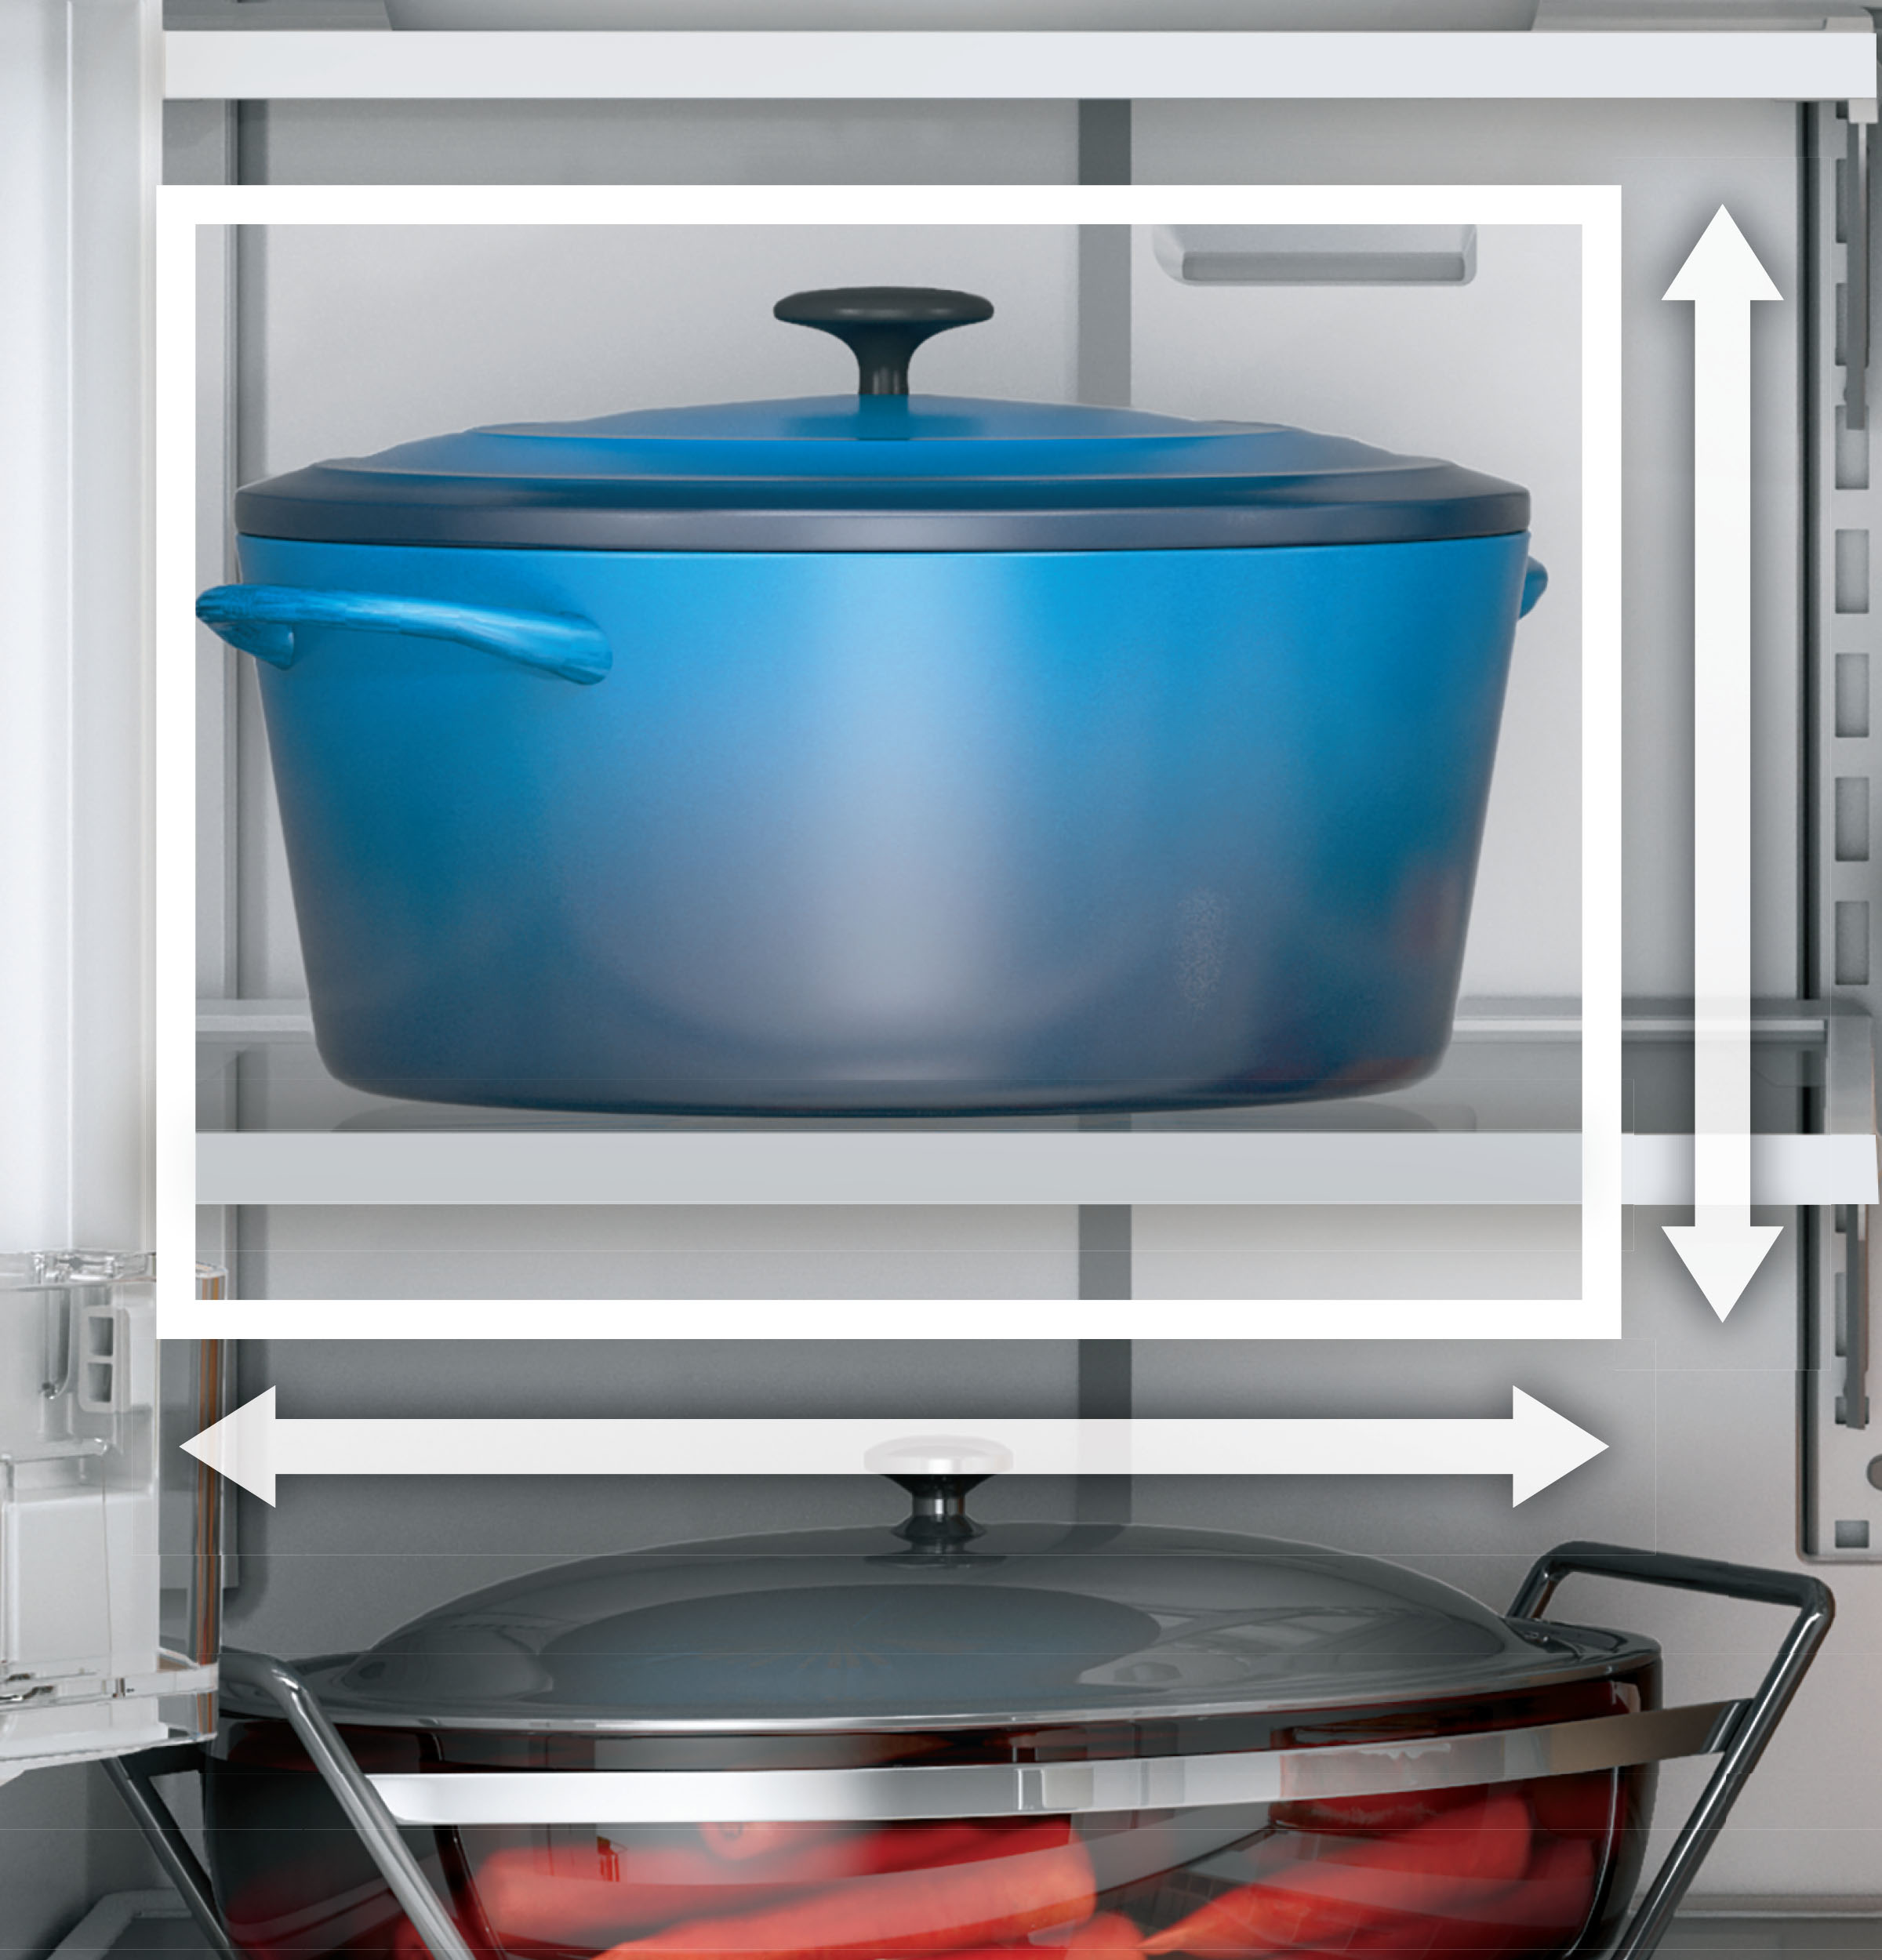 Model: GYE18JSLSS   GE GE® ENERGY STAR® 17.5 Cu. Ft. Counter-Depth French-Door Refrigerator